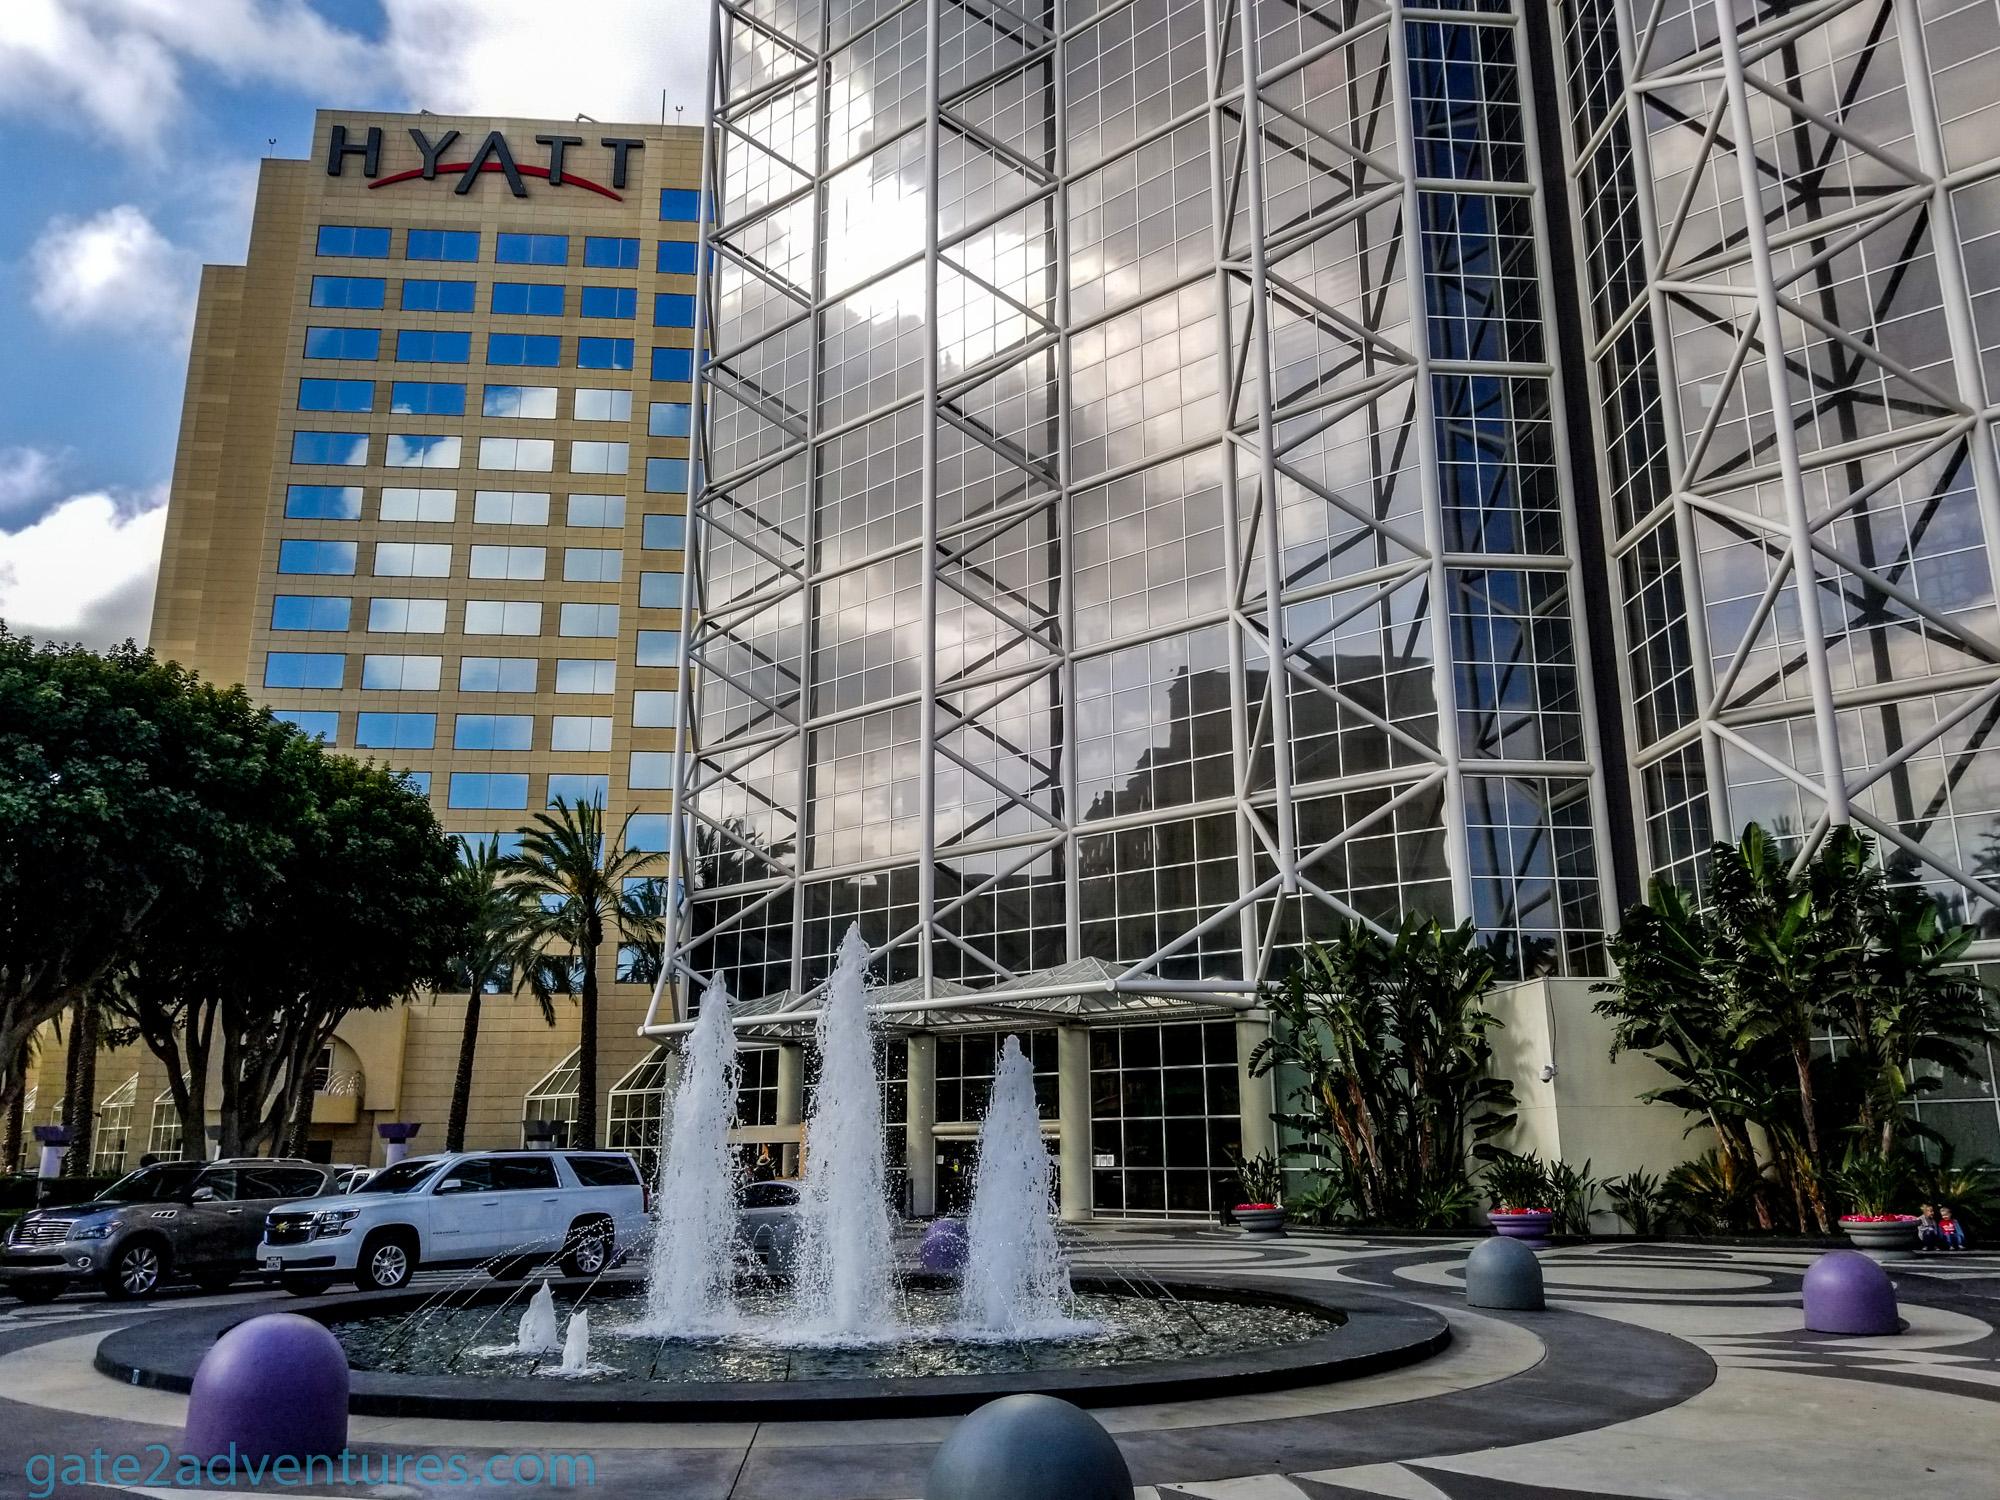 Hotel Review: Hyatt Regency Orange County